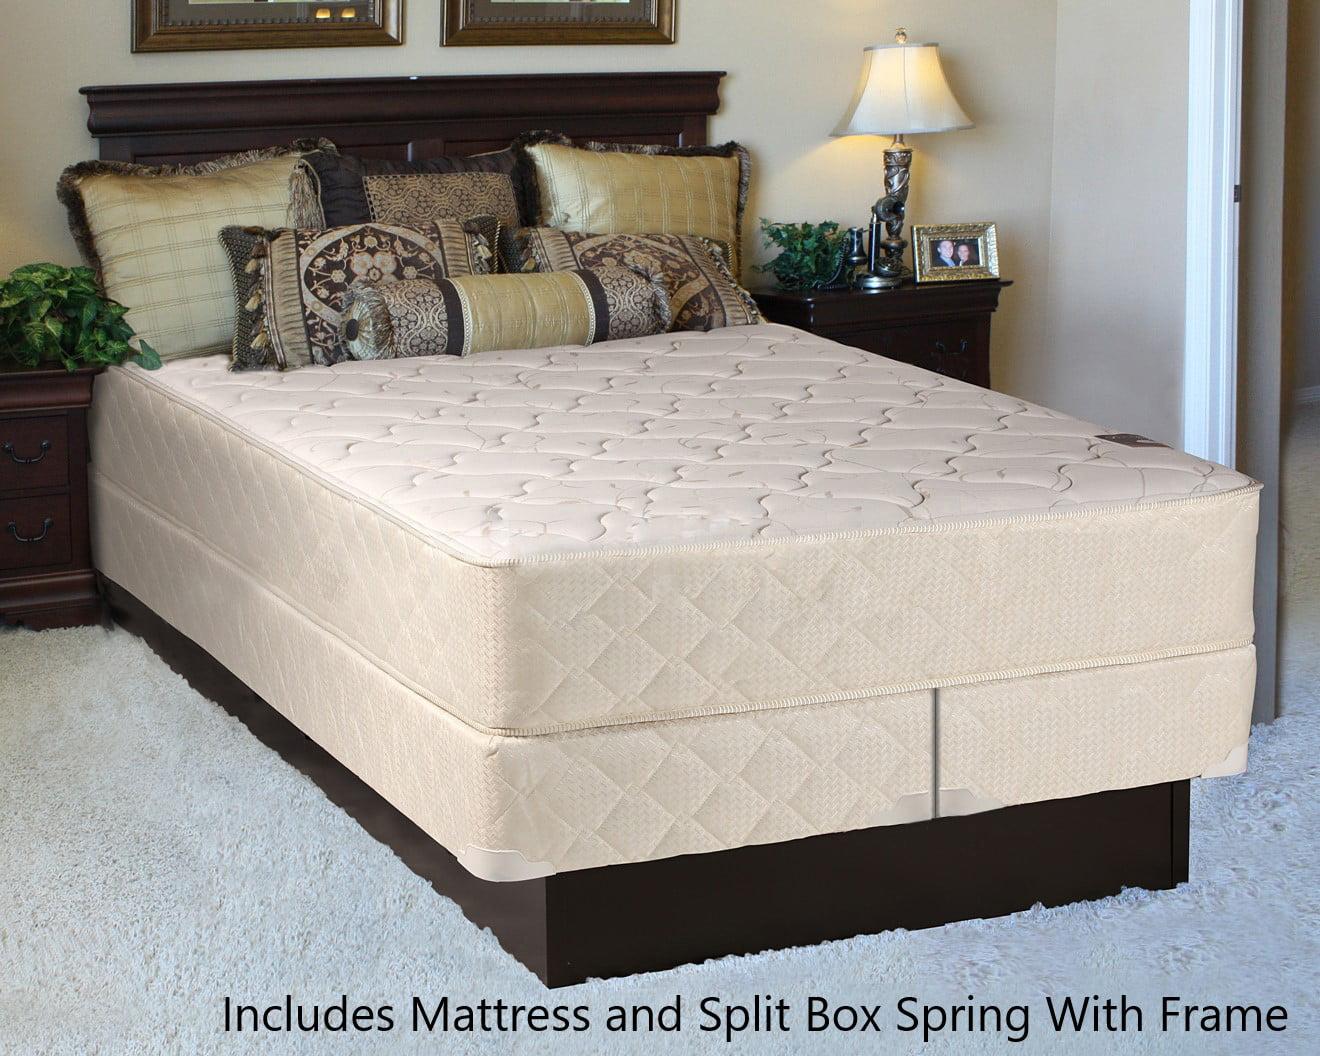 Continental Sleep, 10-inch Fully Assembled Innerspring Medium Plush ...